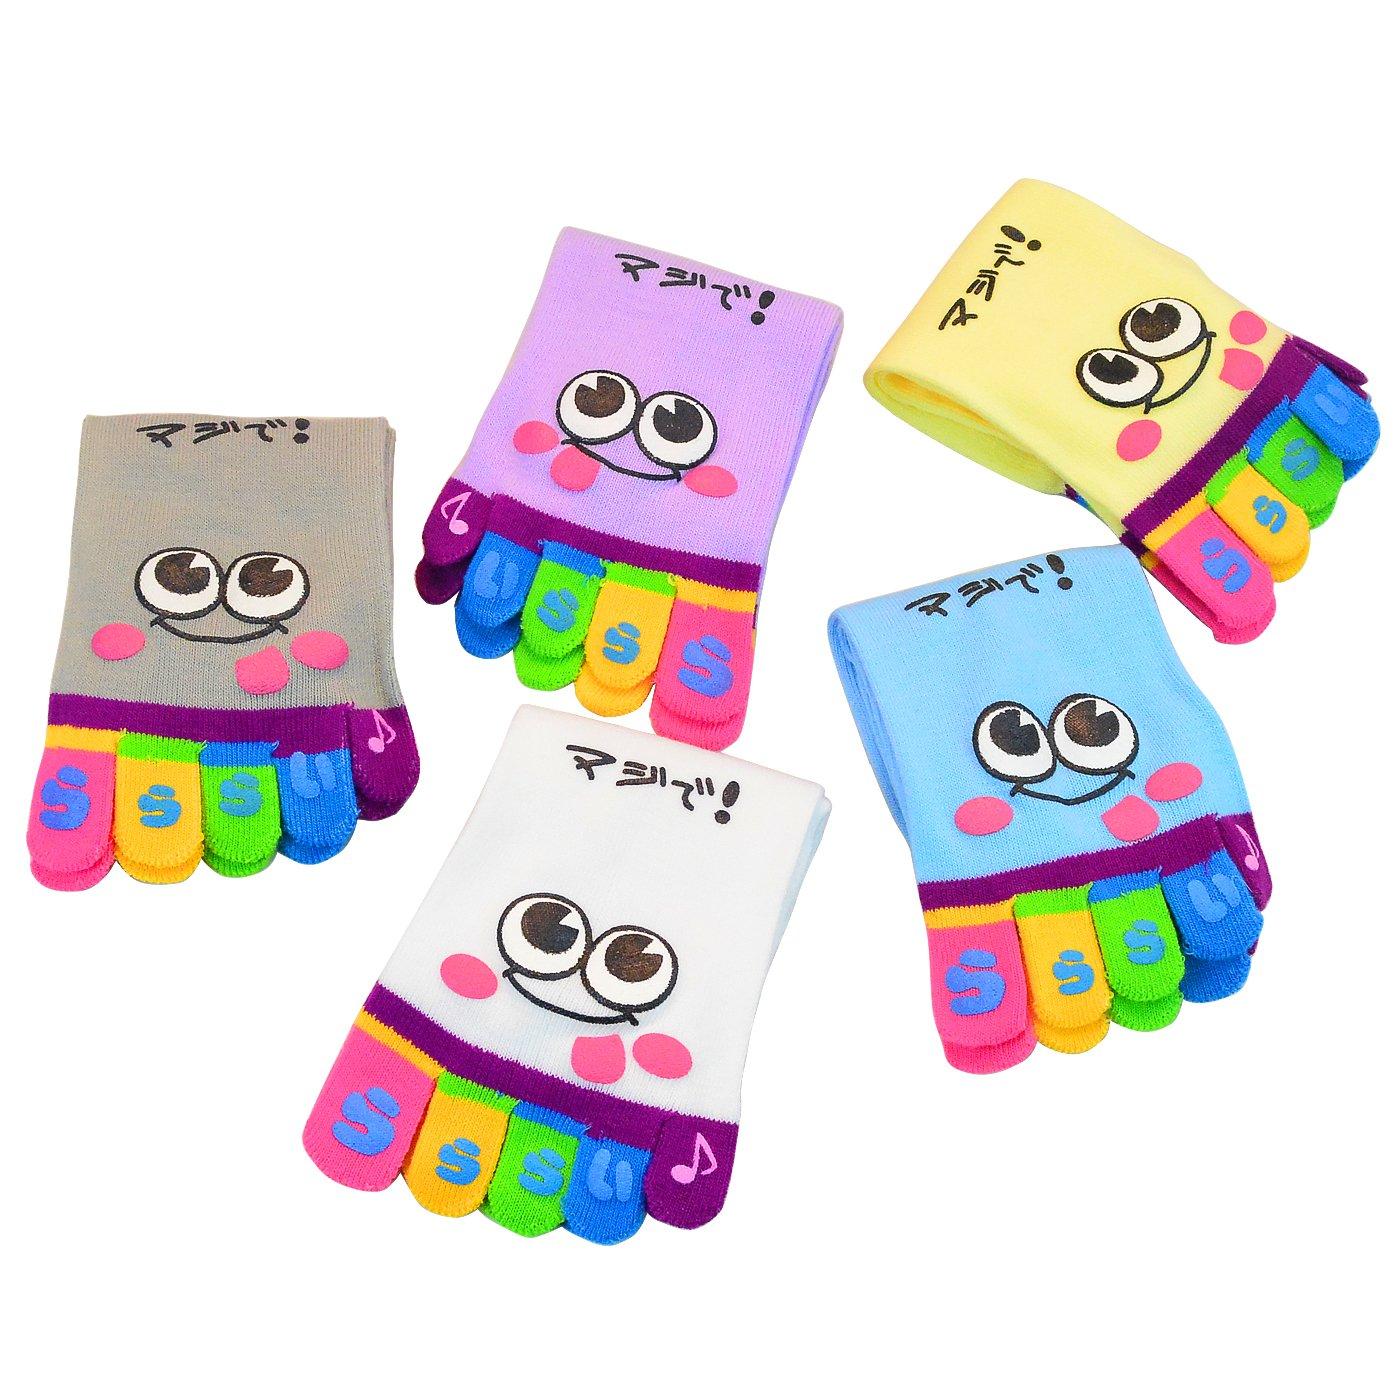 Lystaii 5 Pairs Soft Crew Socks Cotton Comfortable Socks Unisex Random Color